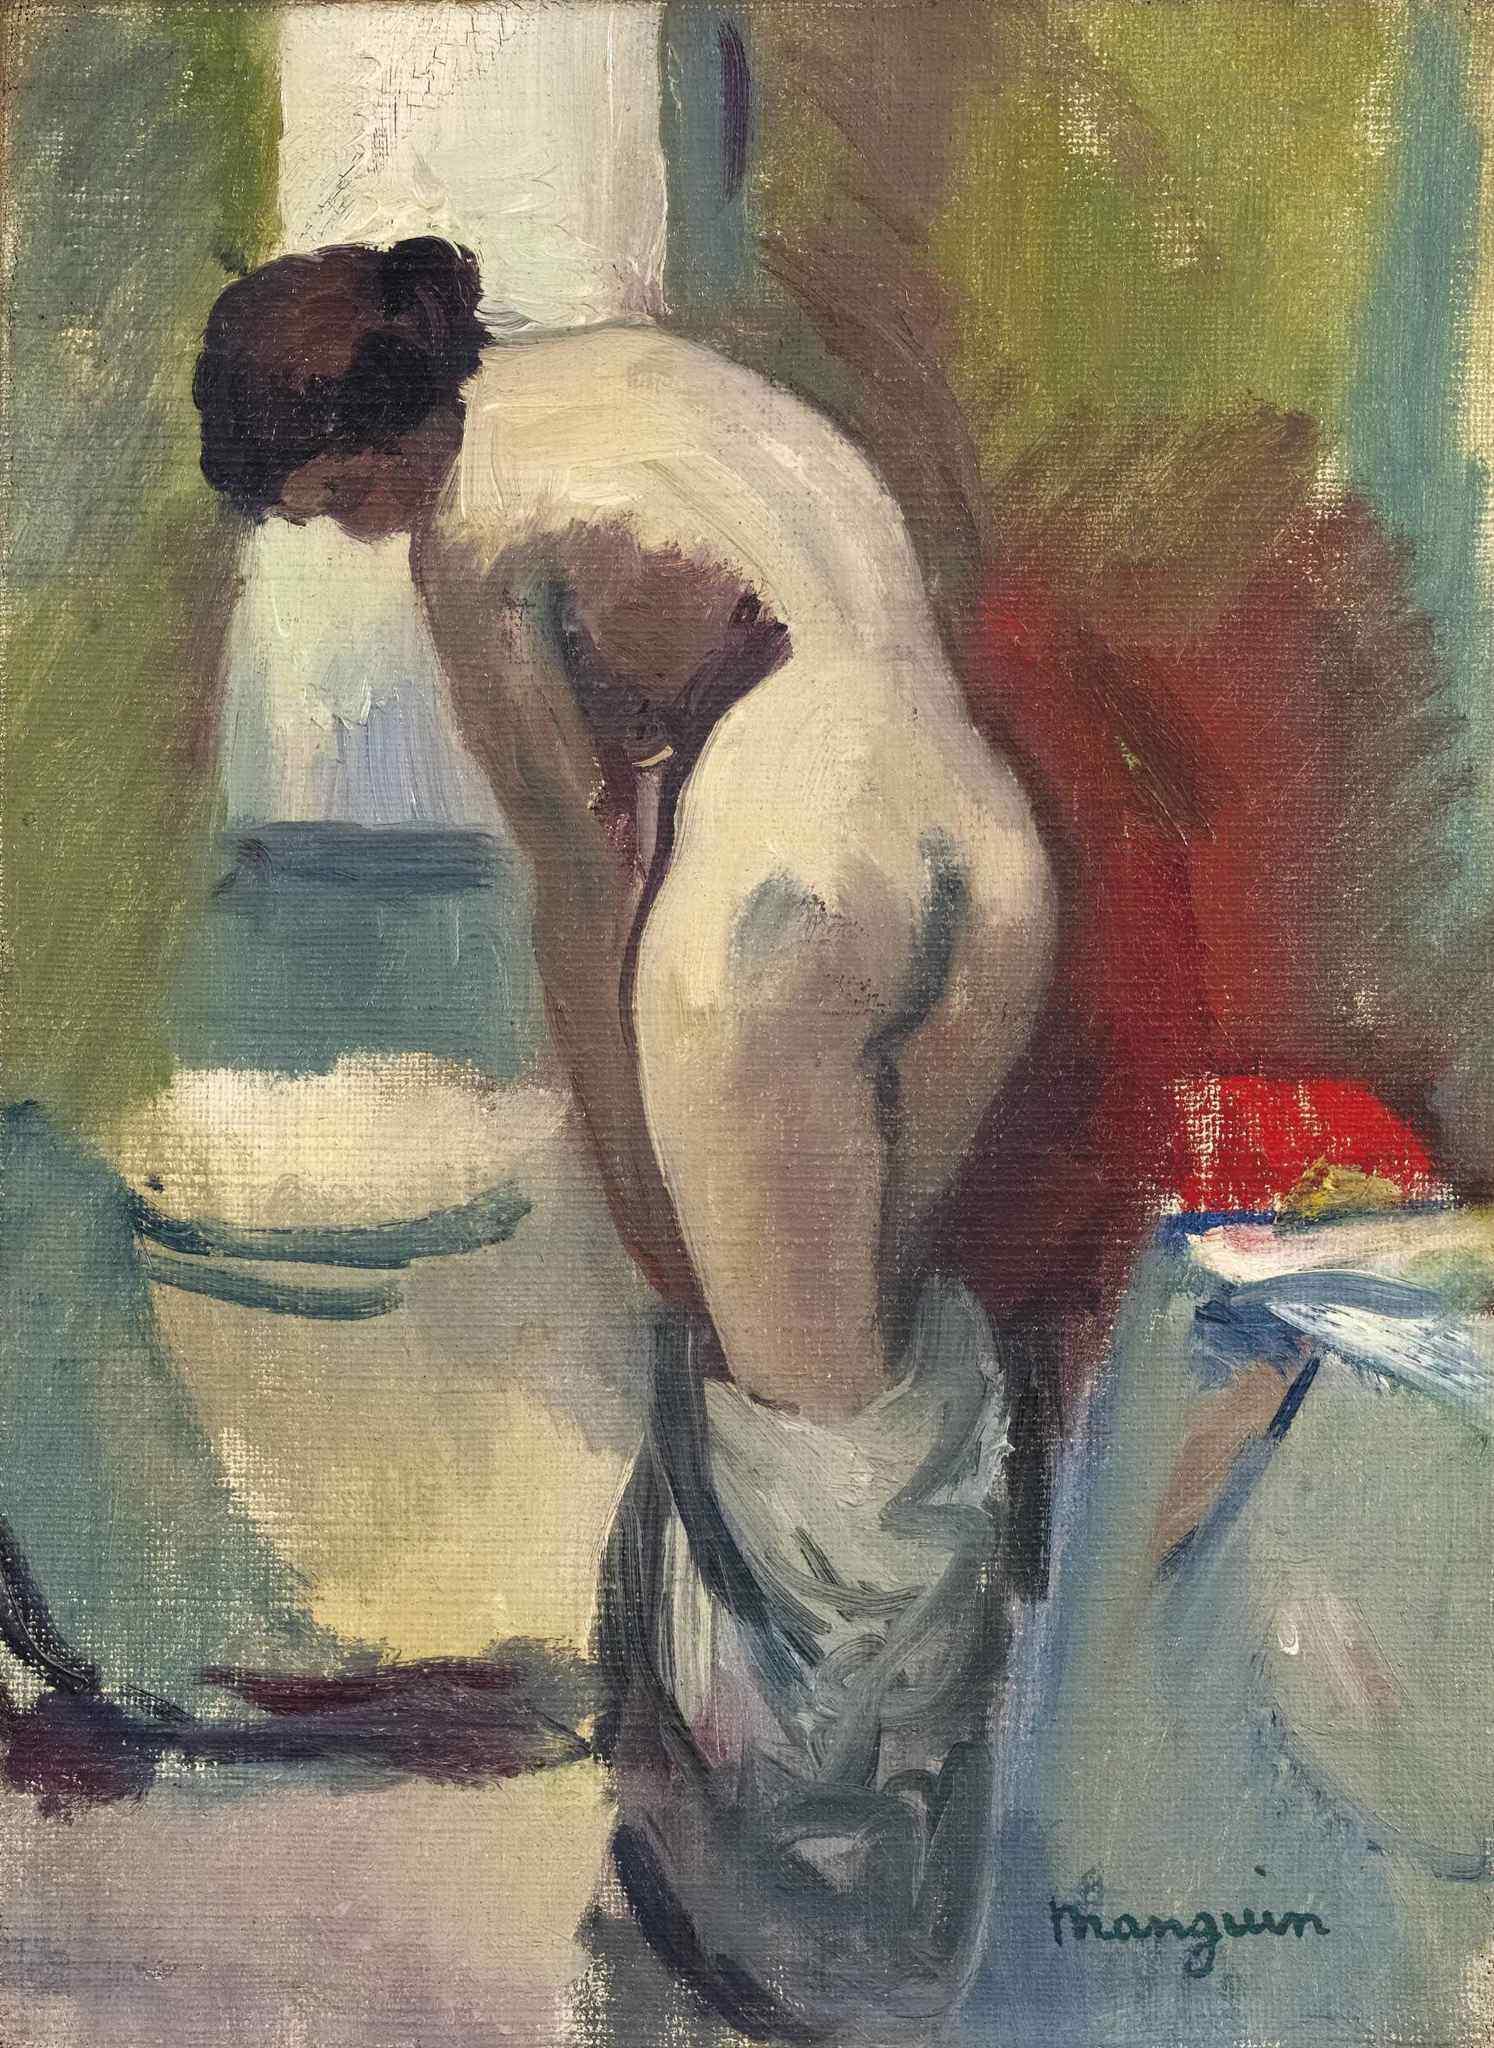 Henri Manguin, 1874-1949. Стоящая обнаженная. 33.2 x 24.5 см. Частная коллекция